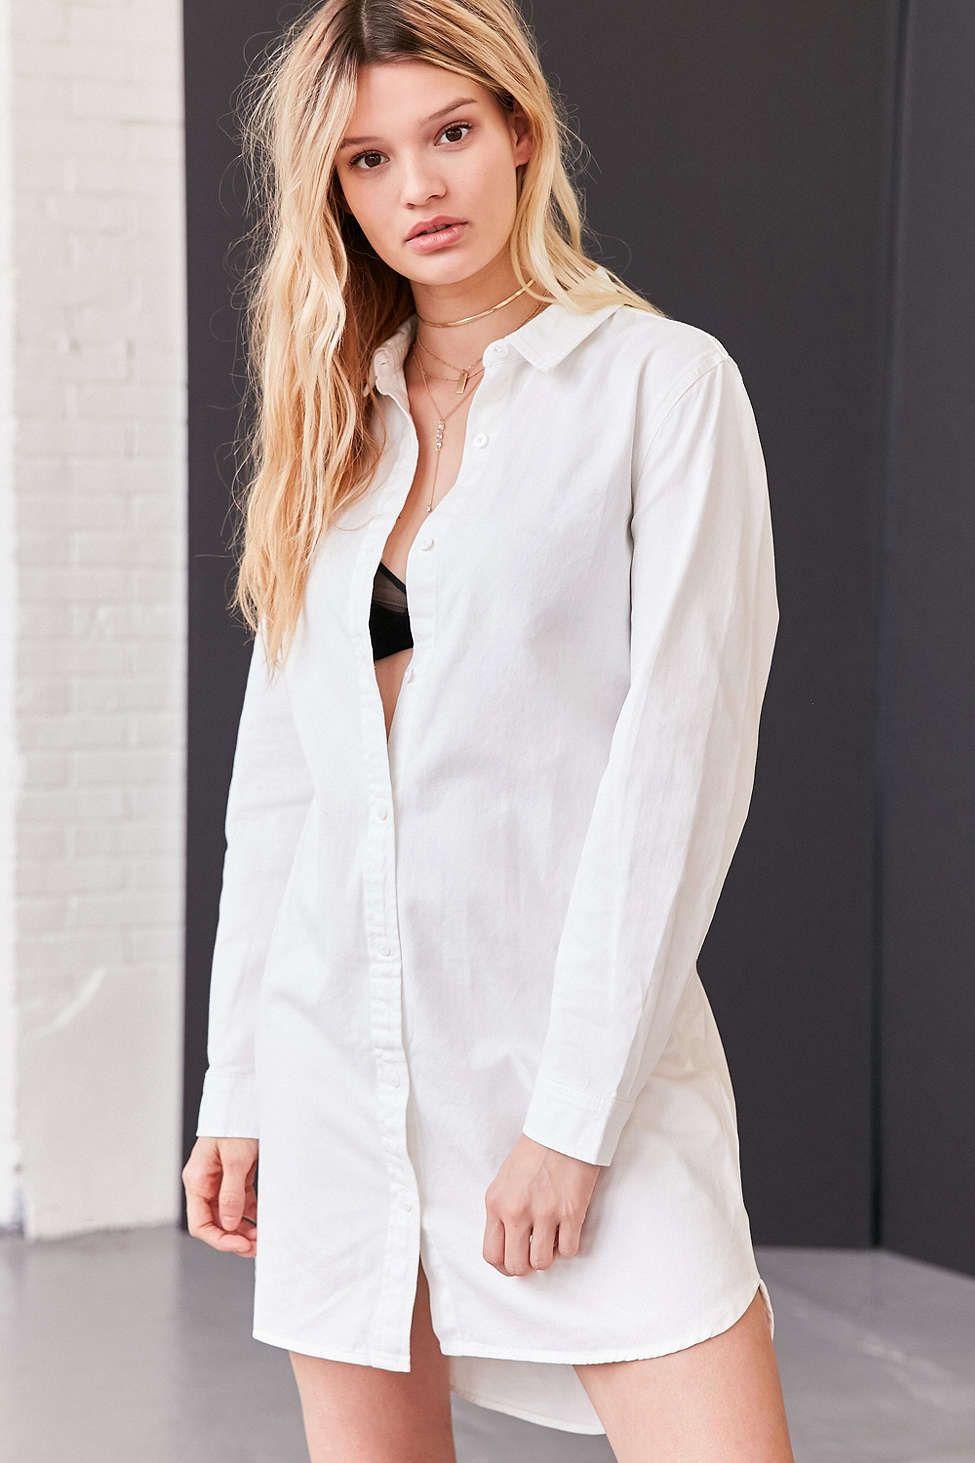 17++ White button down shirt dress info